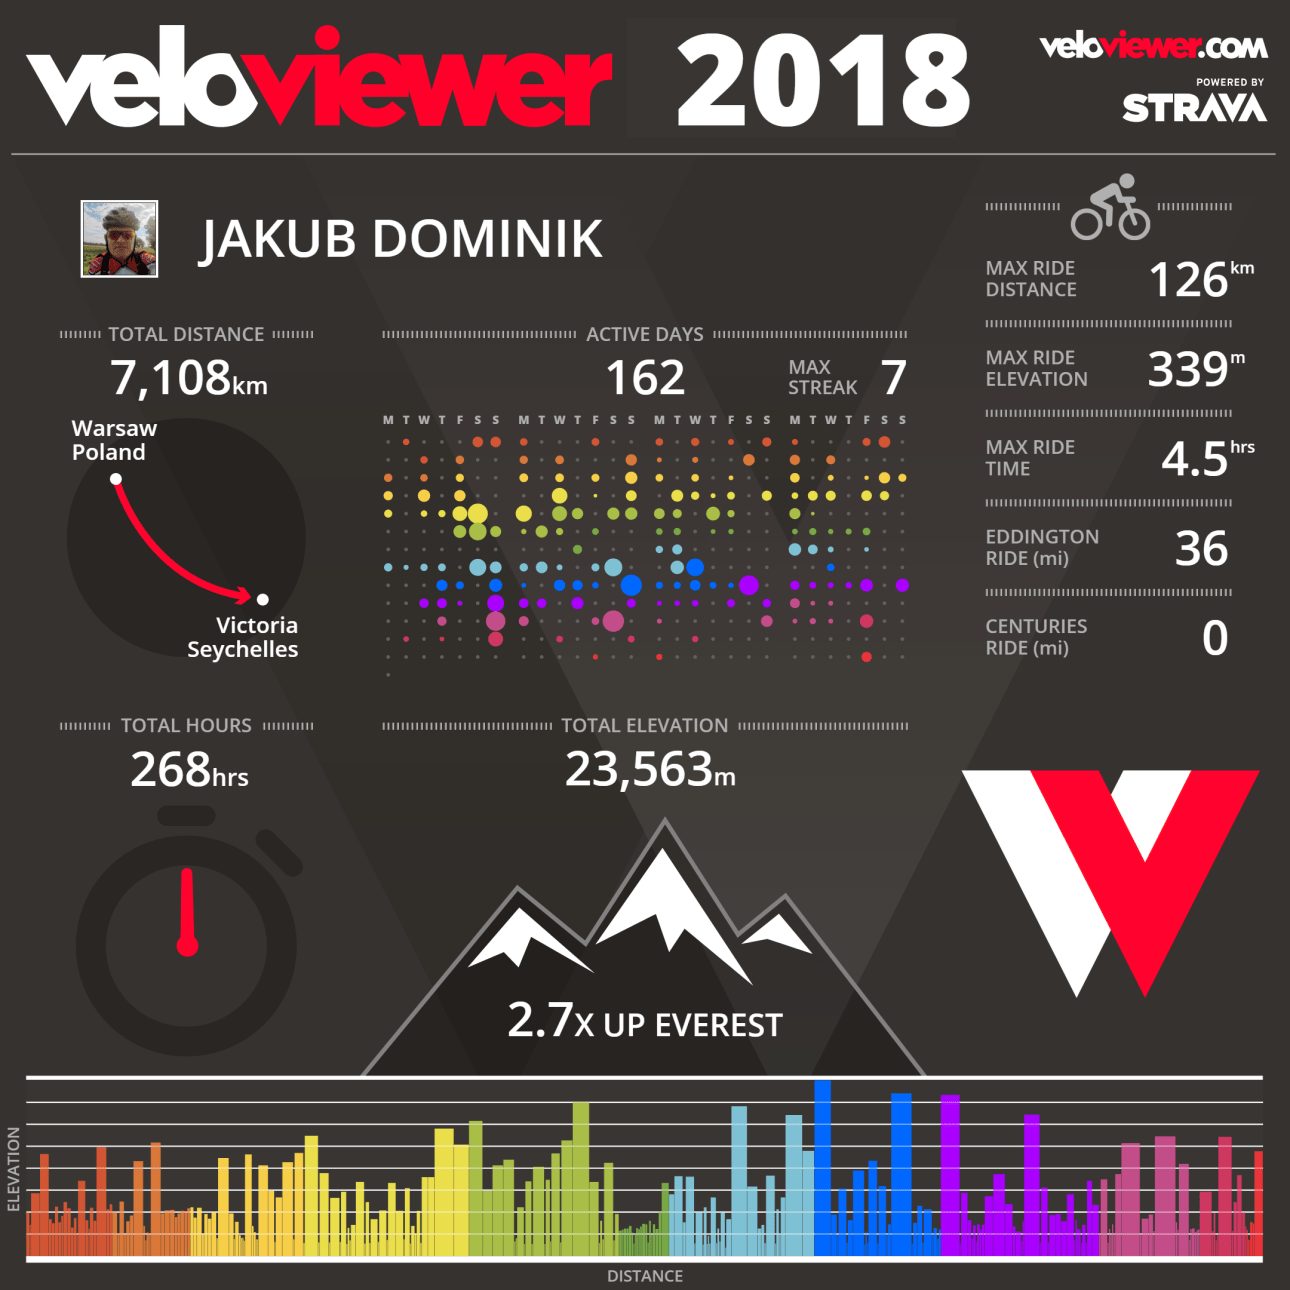 veloviewer 2018